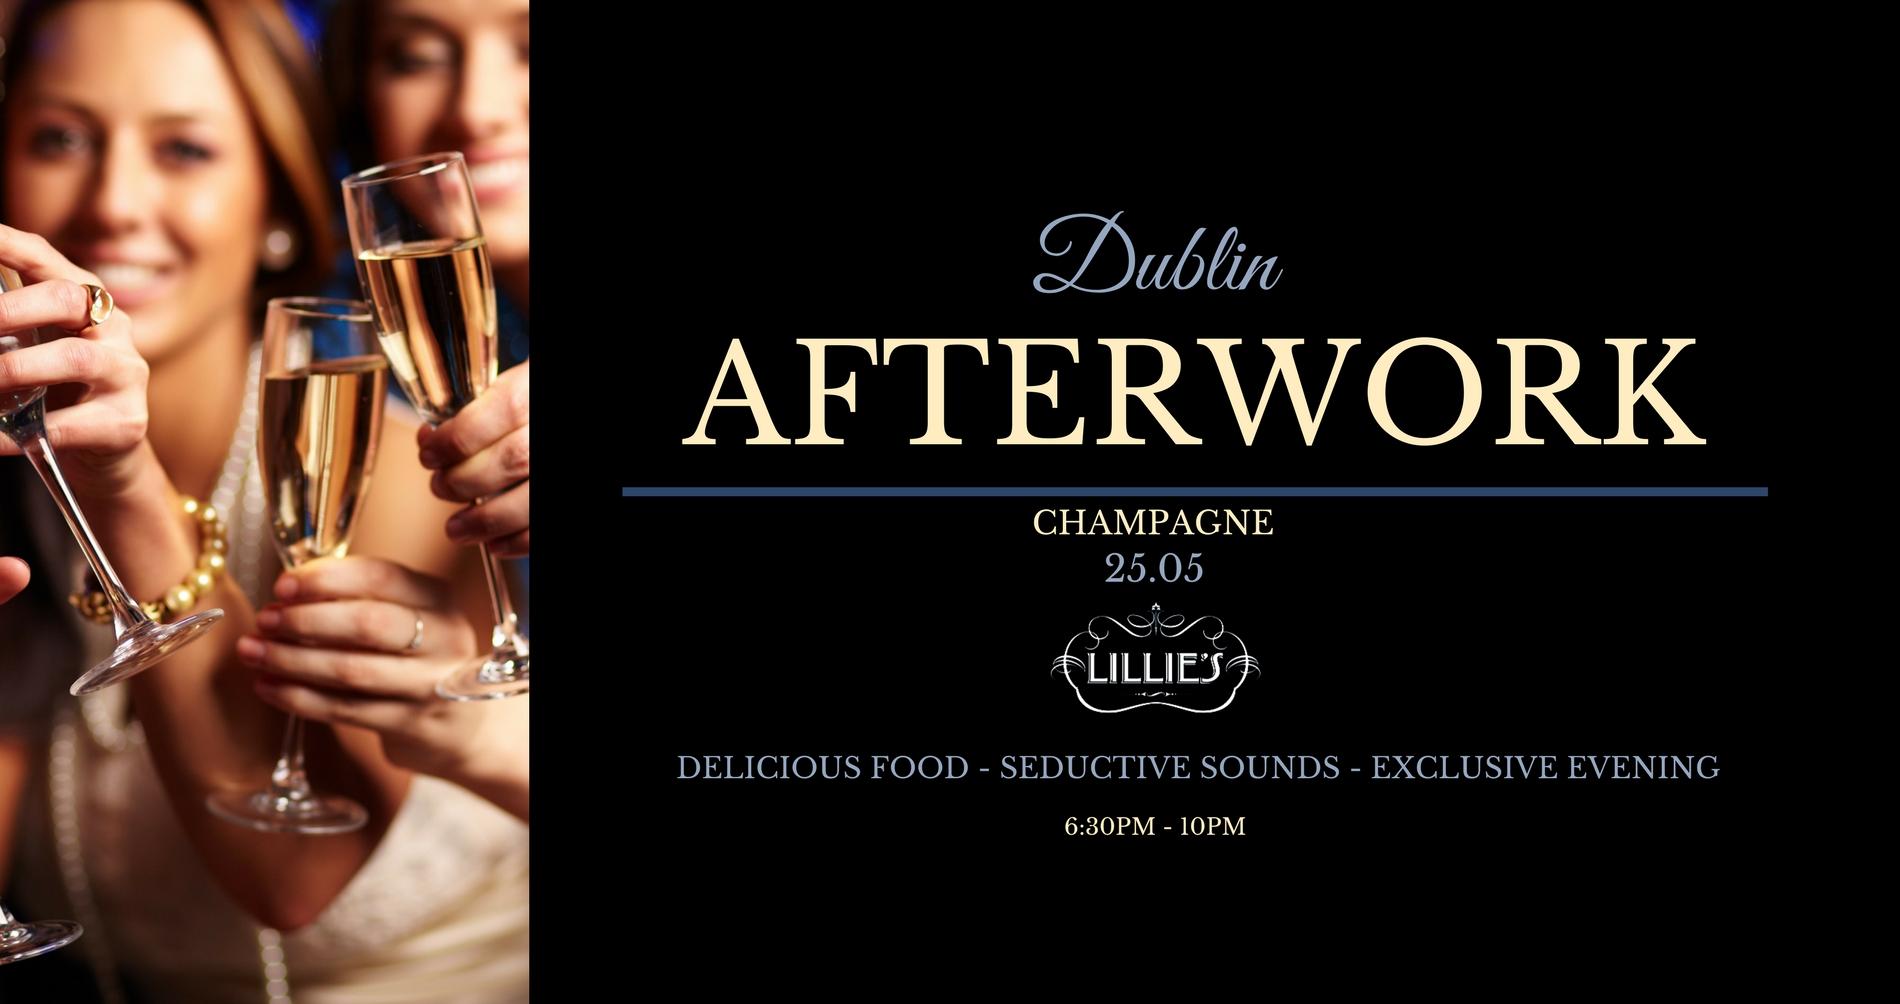 Afterwork Champagne no3 - Lilllies - Dublin